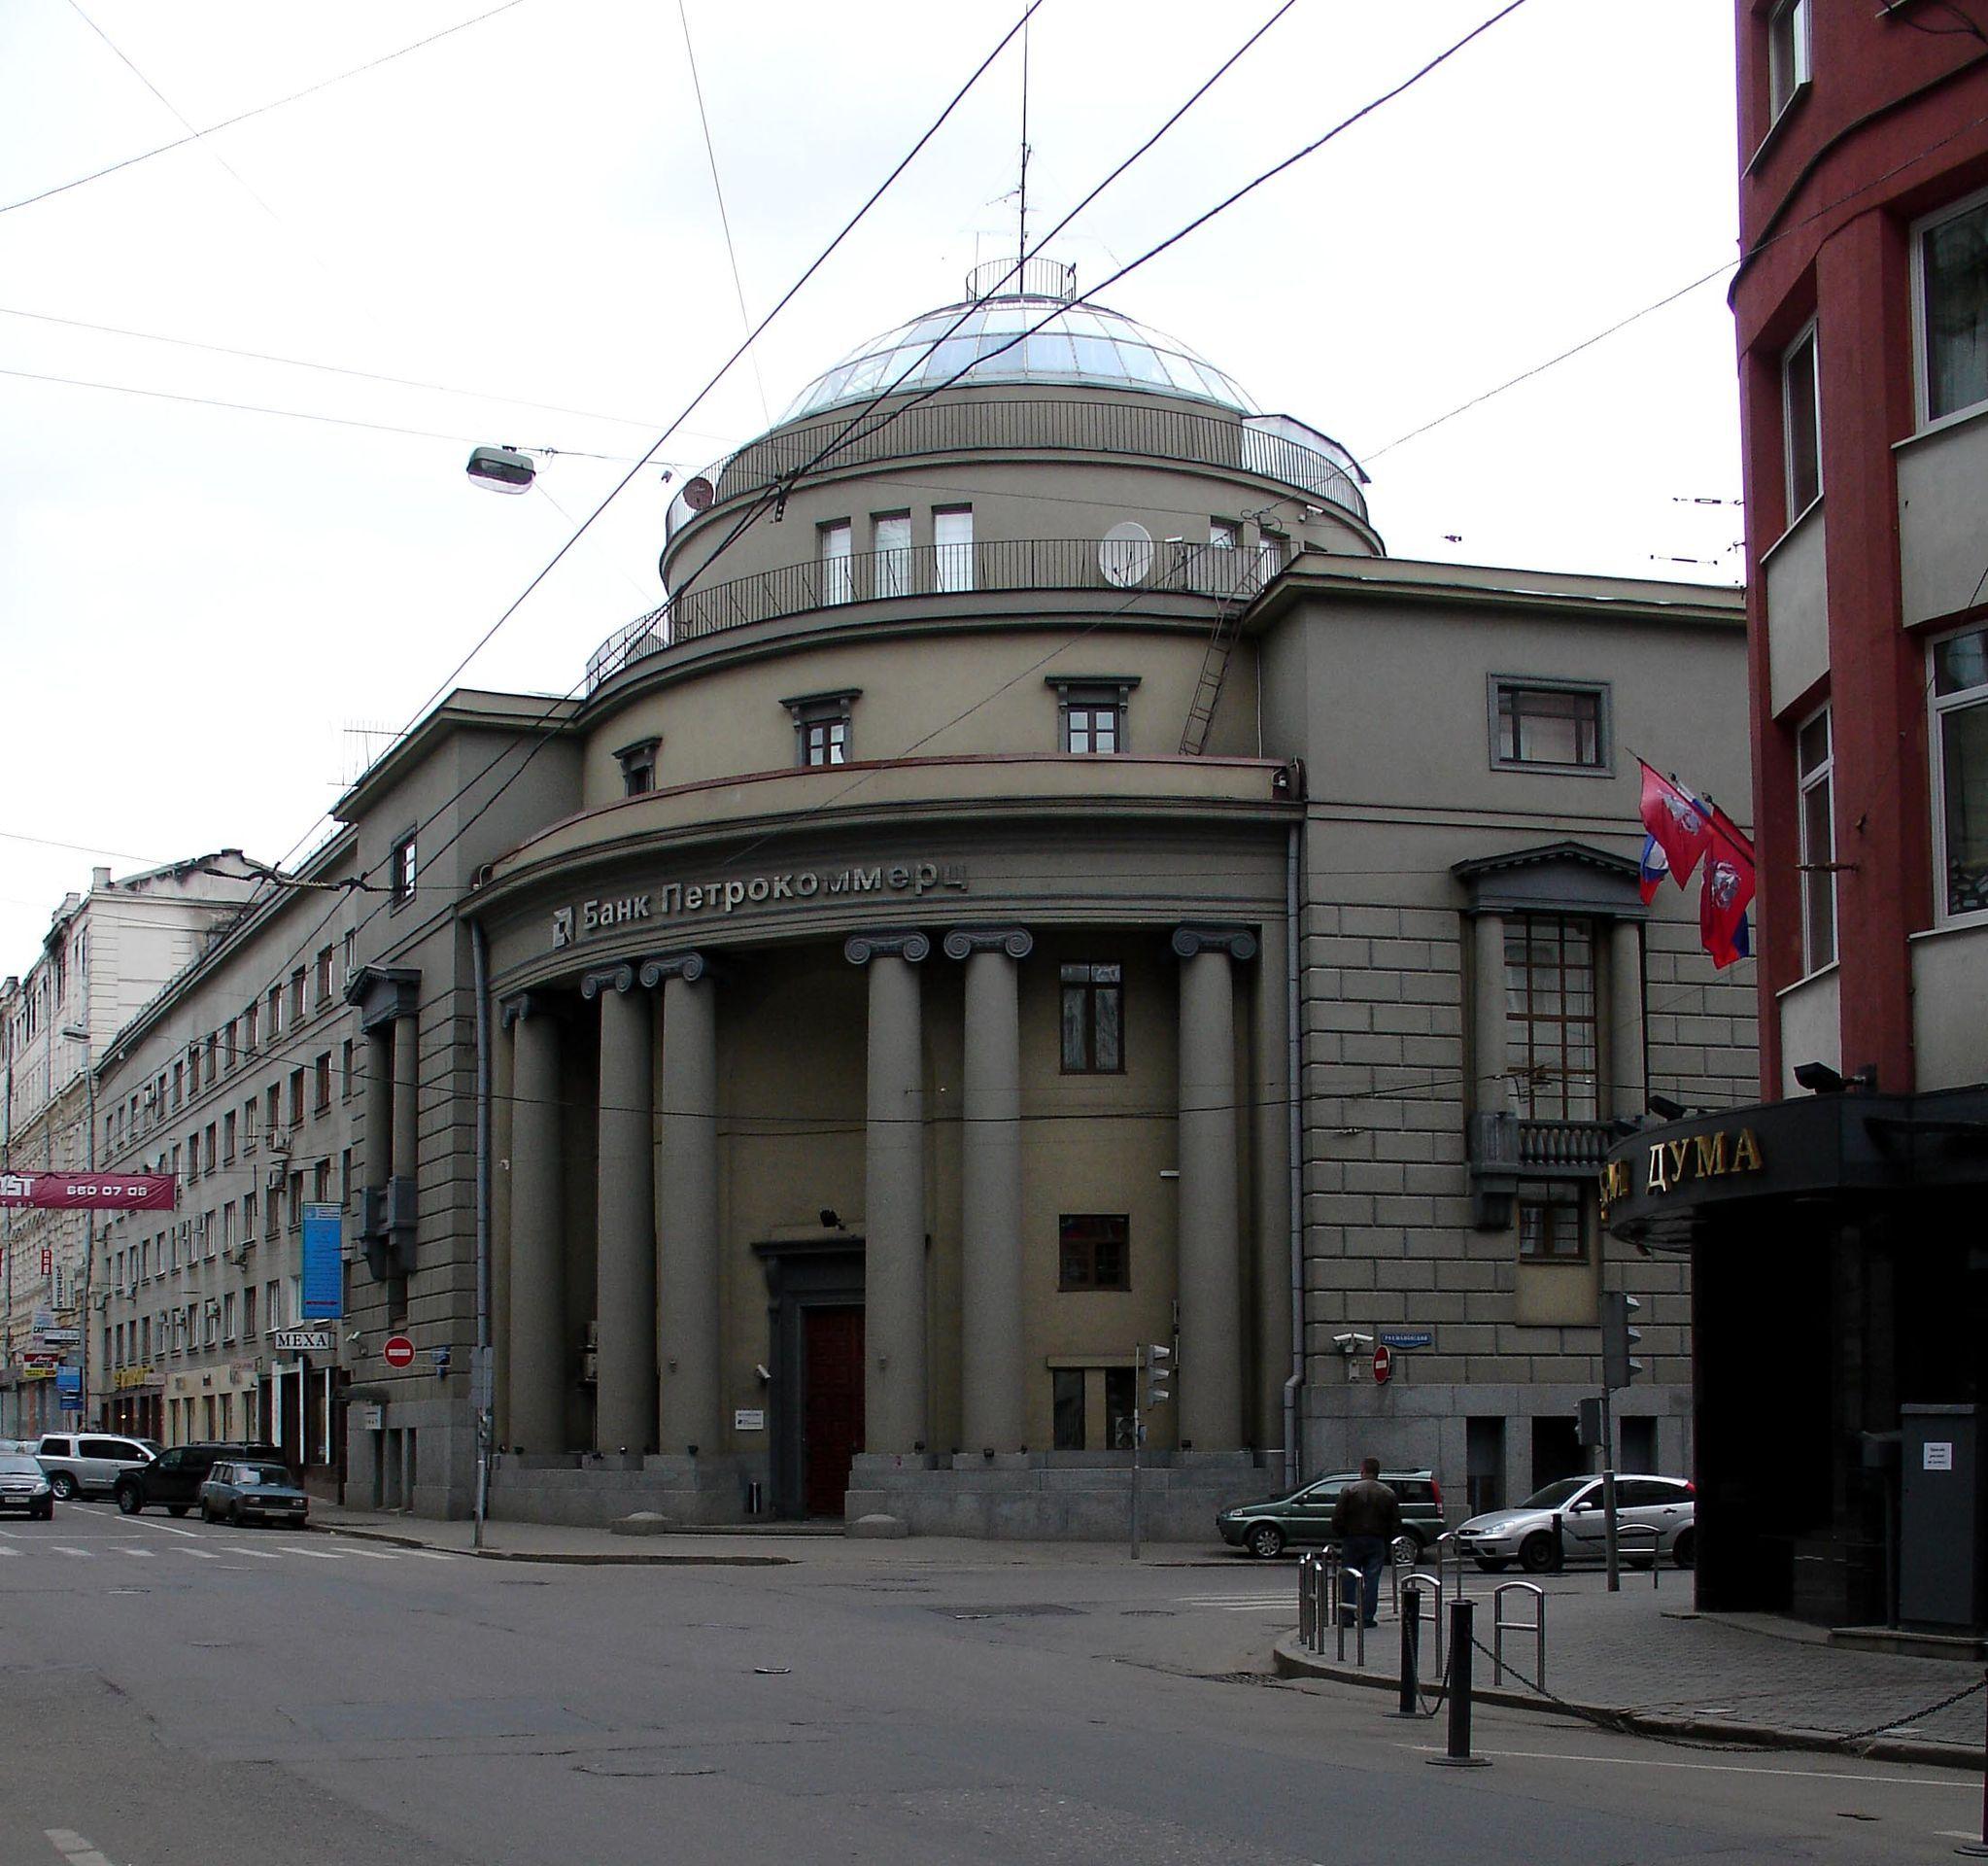 Russian neoclassical revival